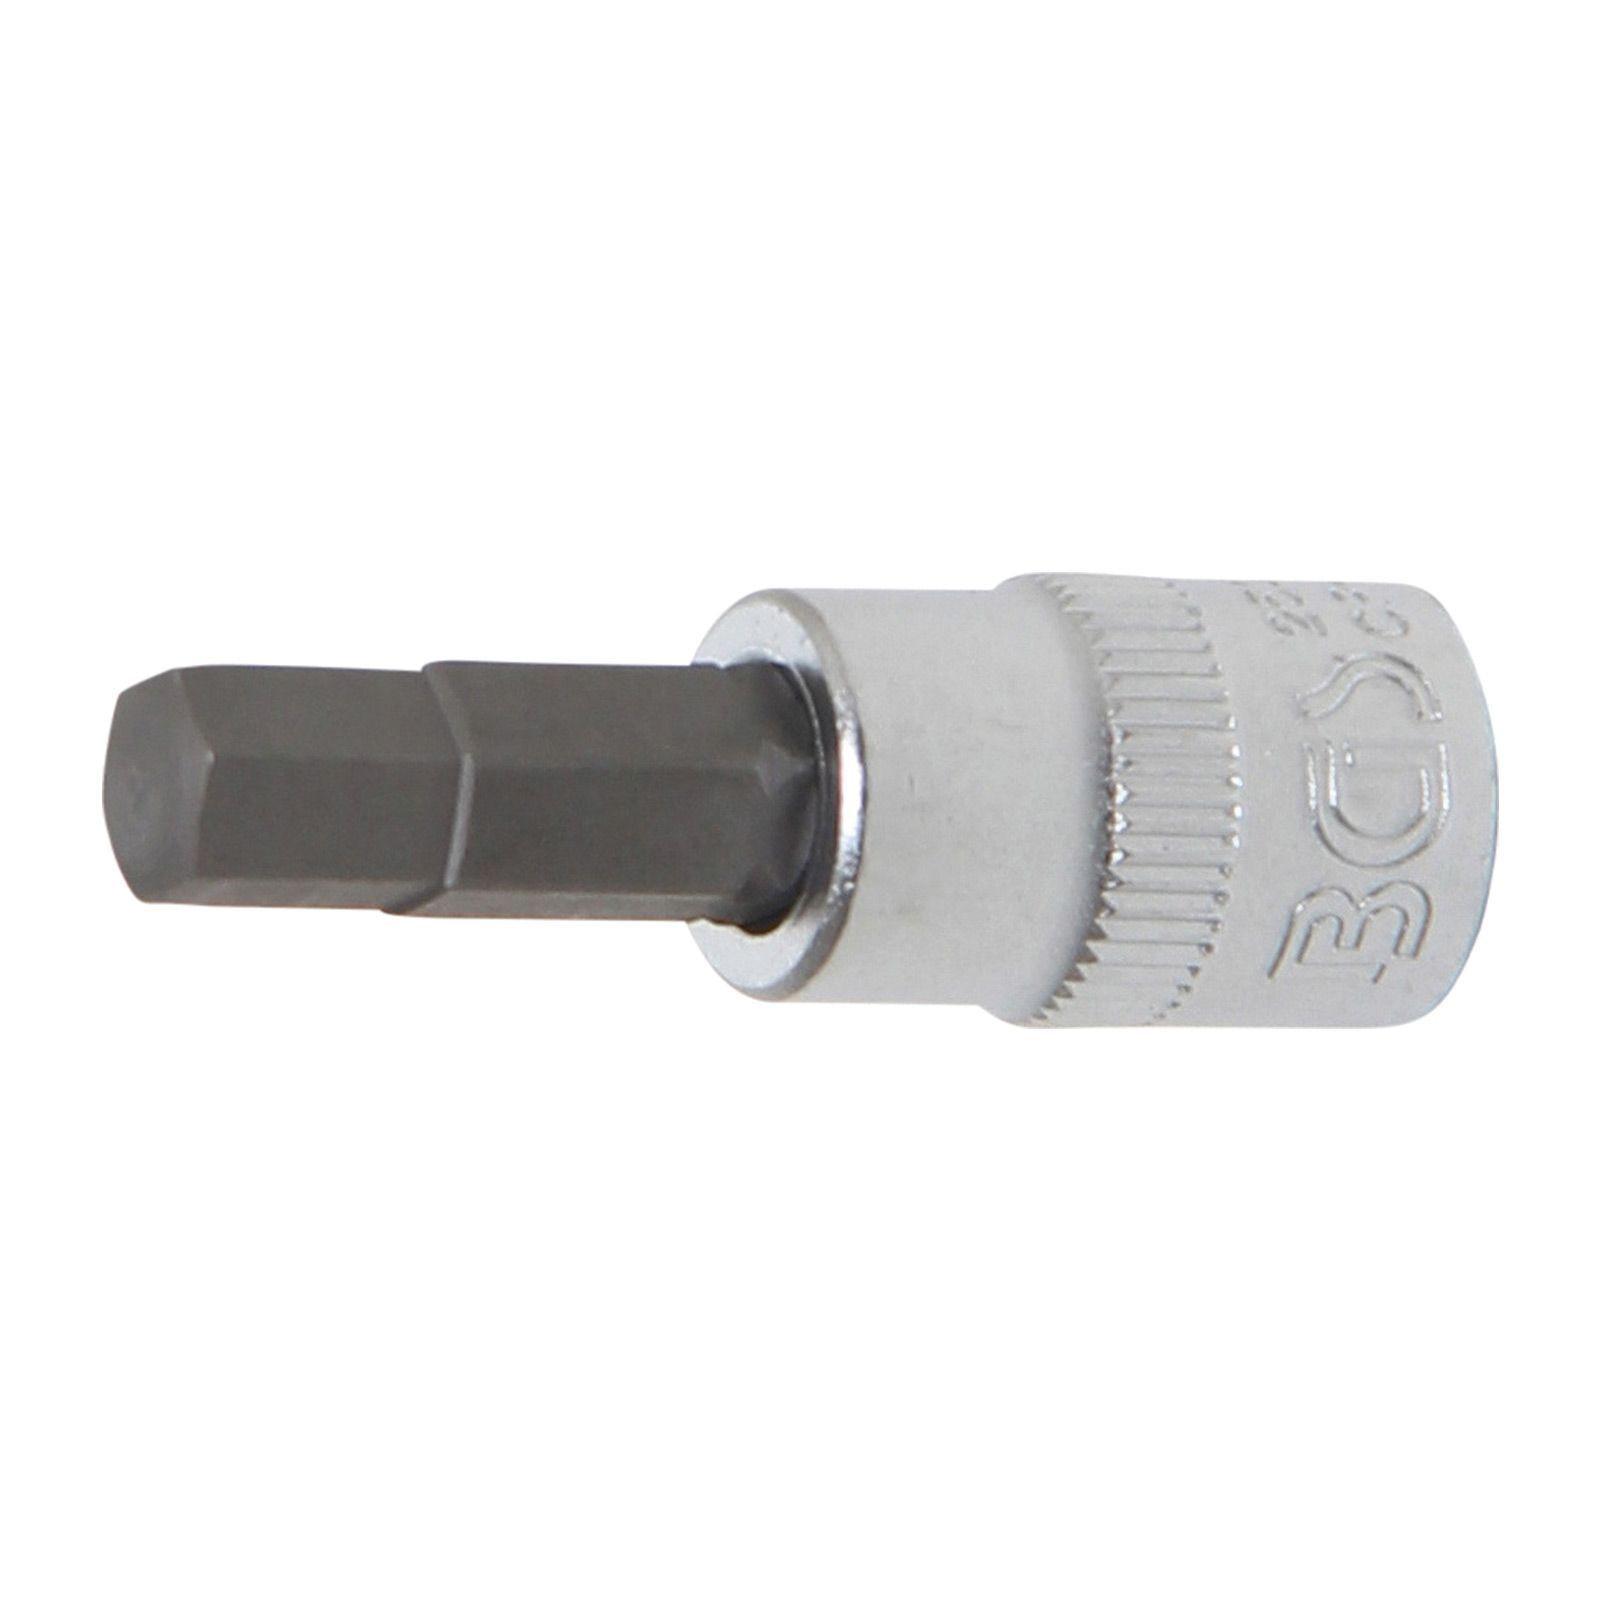 ELEAR/™ KFZ Maulringschl/üssel Gabelringschl/üssel Ringschl/üssel Kombischl/üssel Ring Schl/üssel 7mm